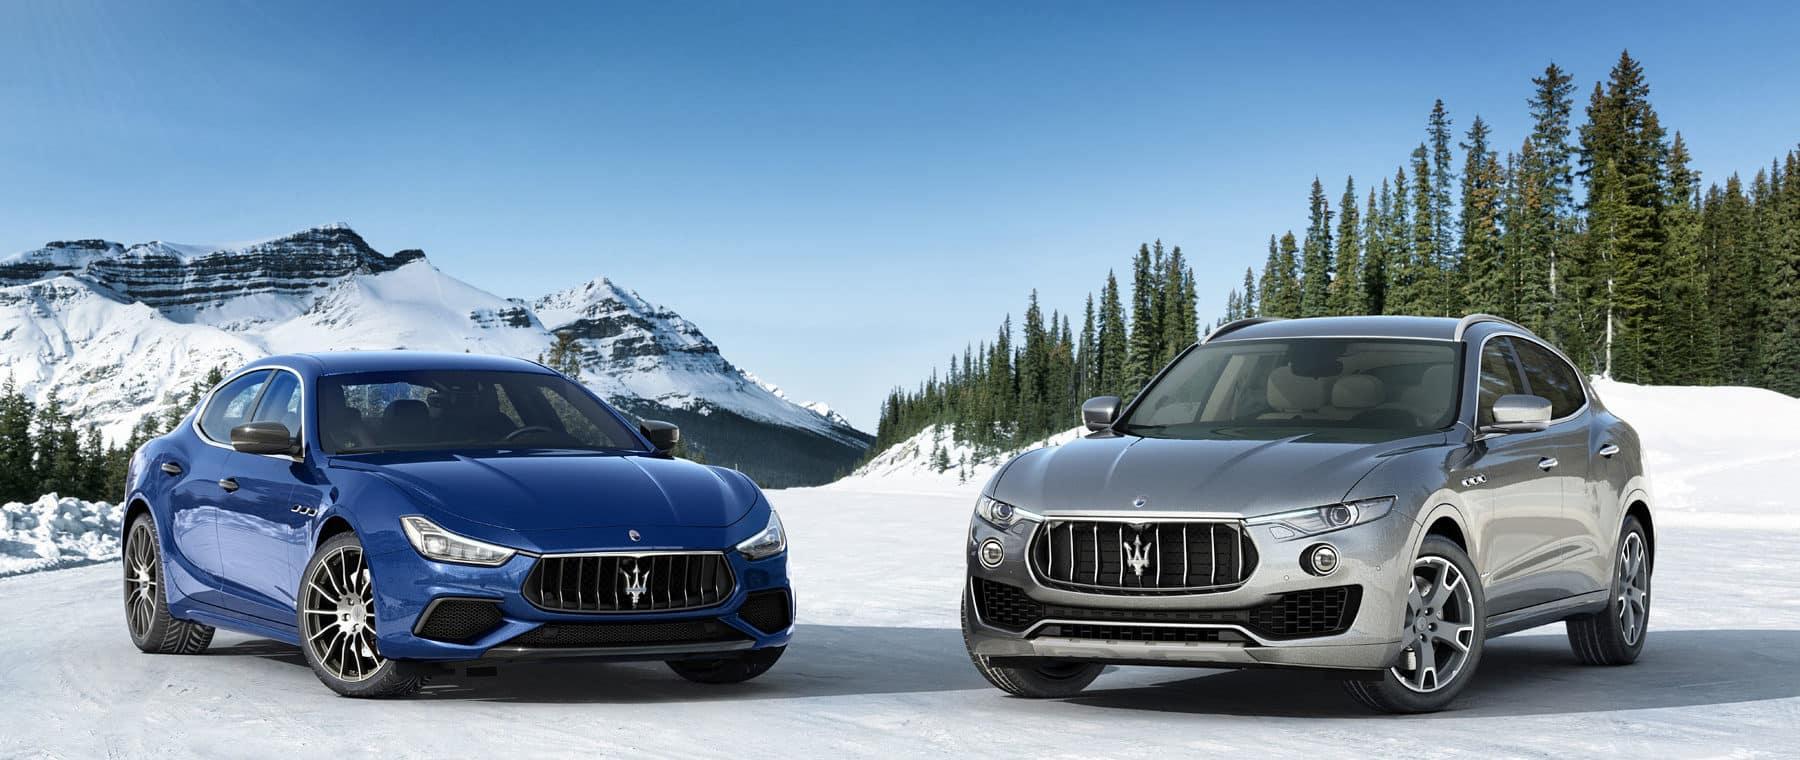 Maserati Of Salt Lake City Luxury Car Dealer And Service Repair - Maserati car dealership